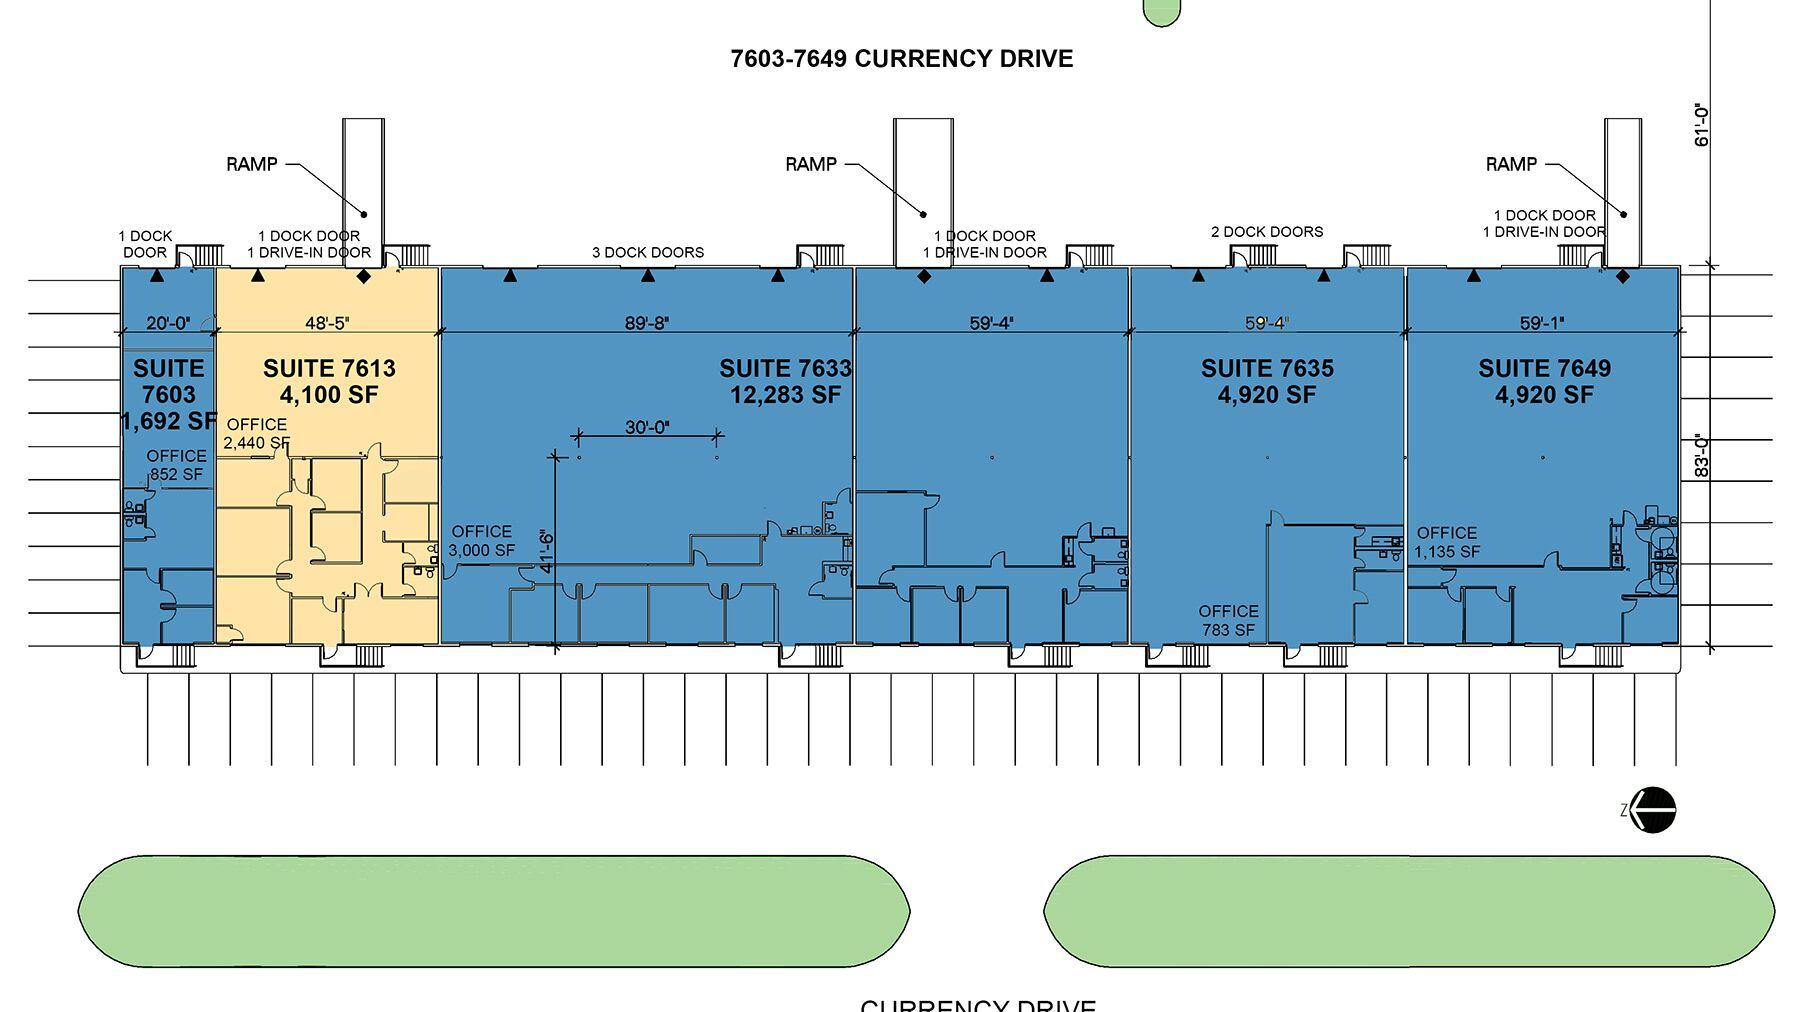 DPM-Orlando-Central-Park-1803_7603-7649-Currency-Dr_Flyer-Plan.jpg